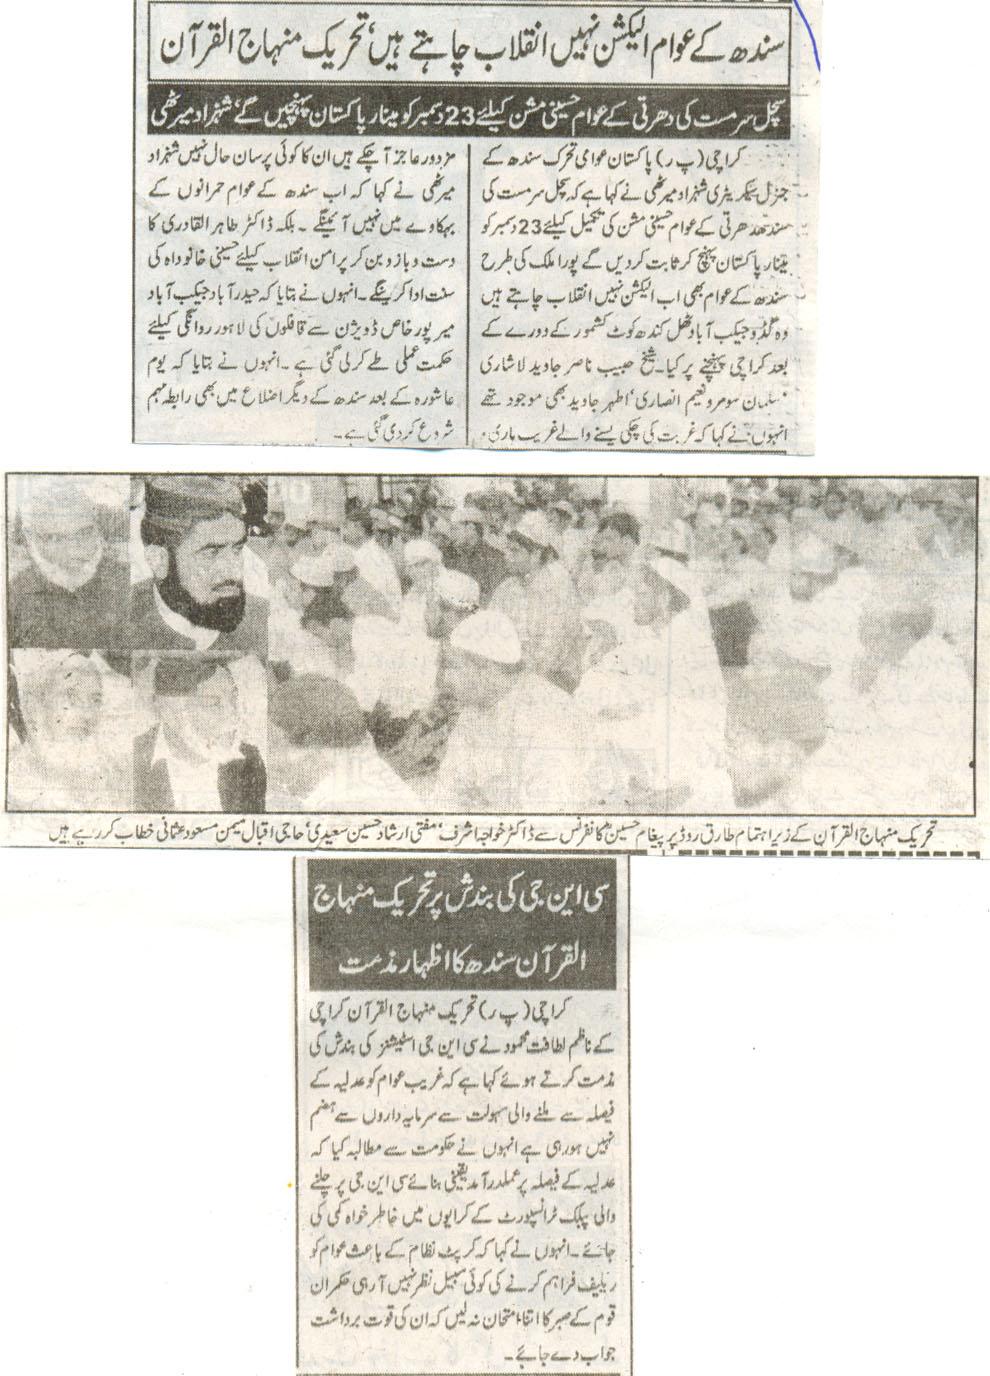 تحریک منہاج القرآن Minhaj-ul-Quran  Print Media Coverage پرنٹ میڈیا کوریج Daily Mahaz